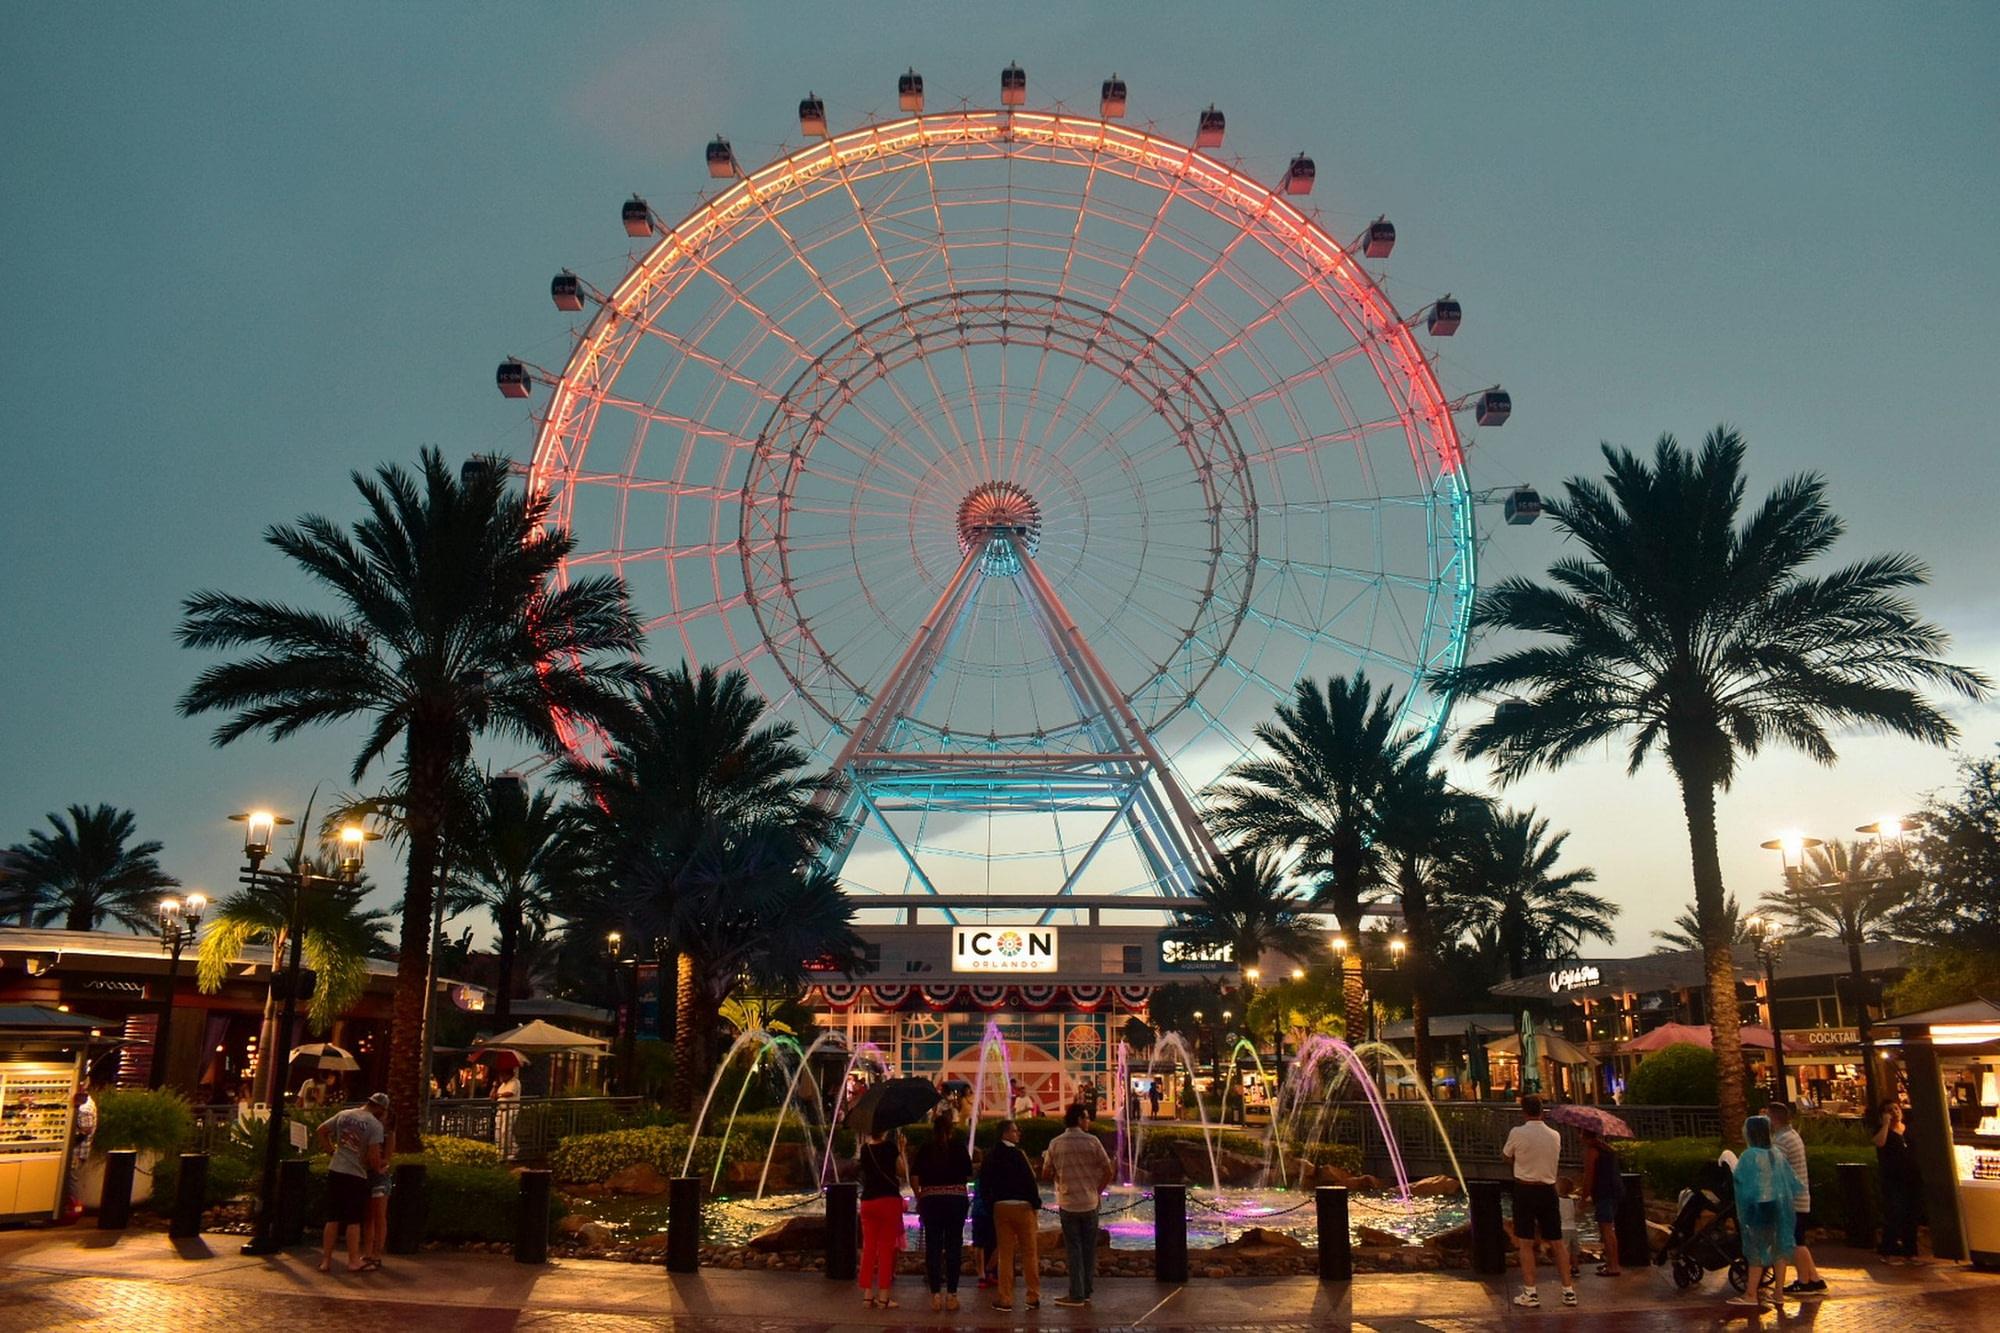 Enjoy the adventures in Orlando